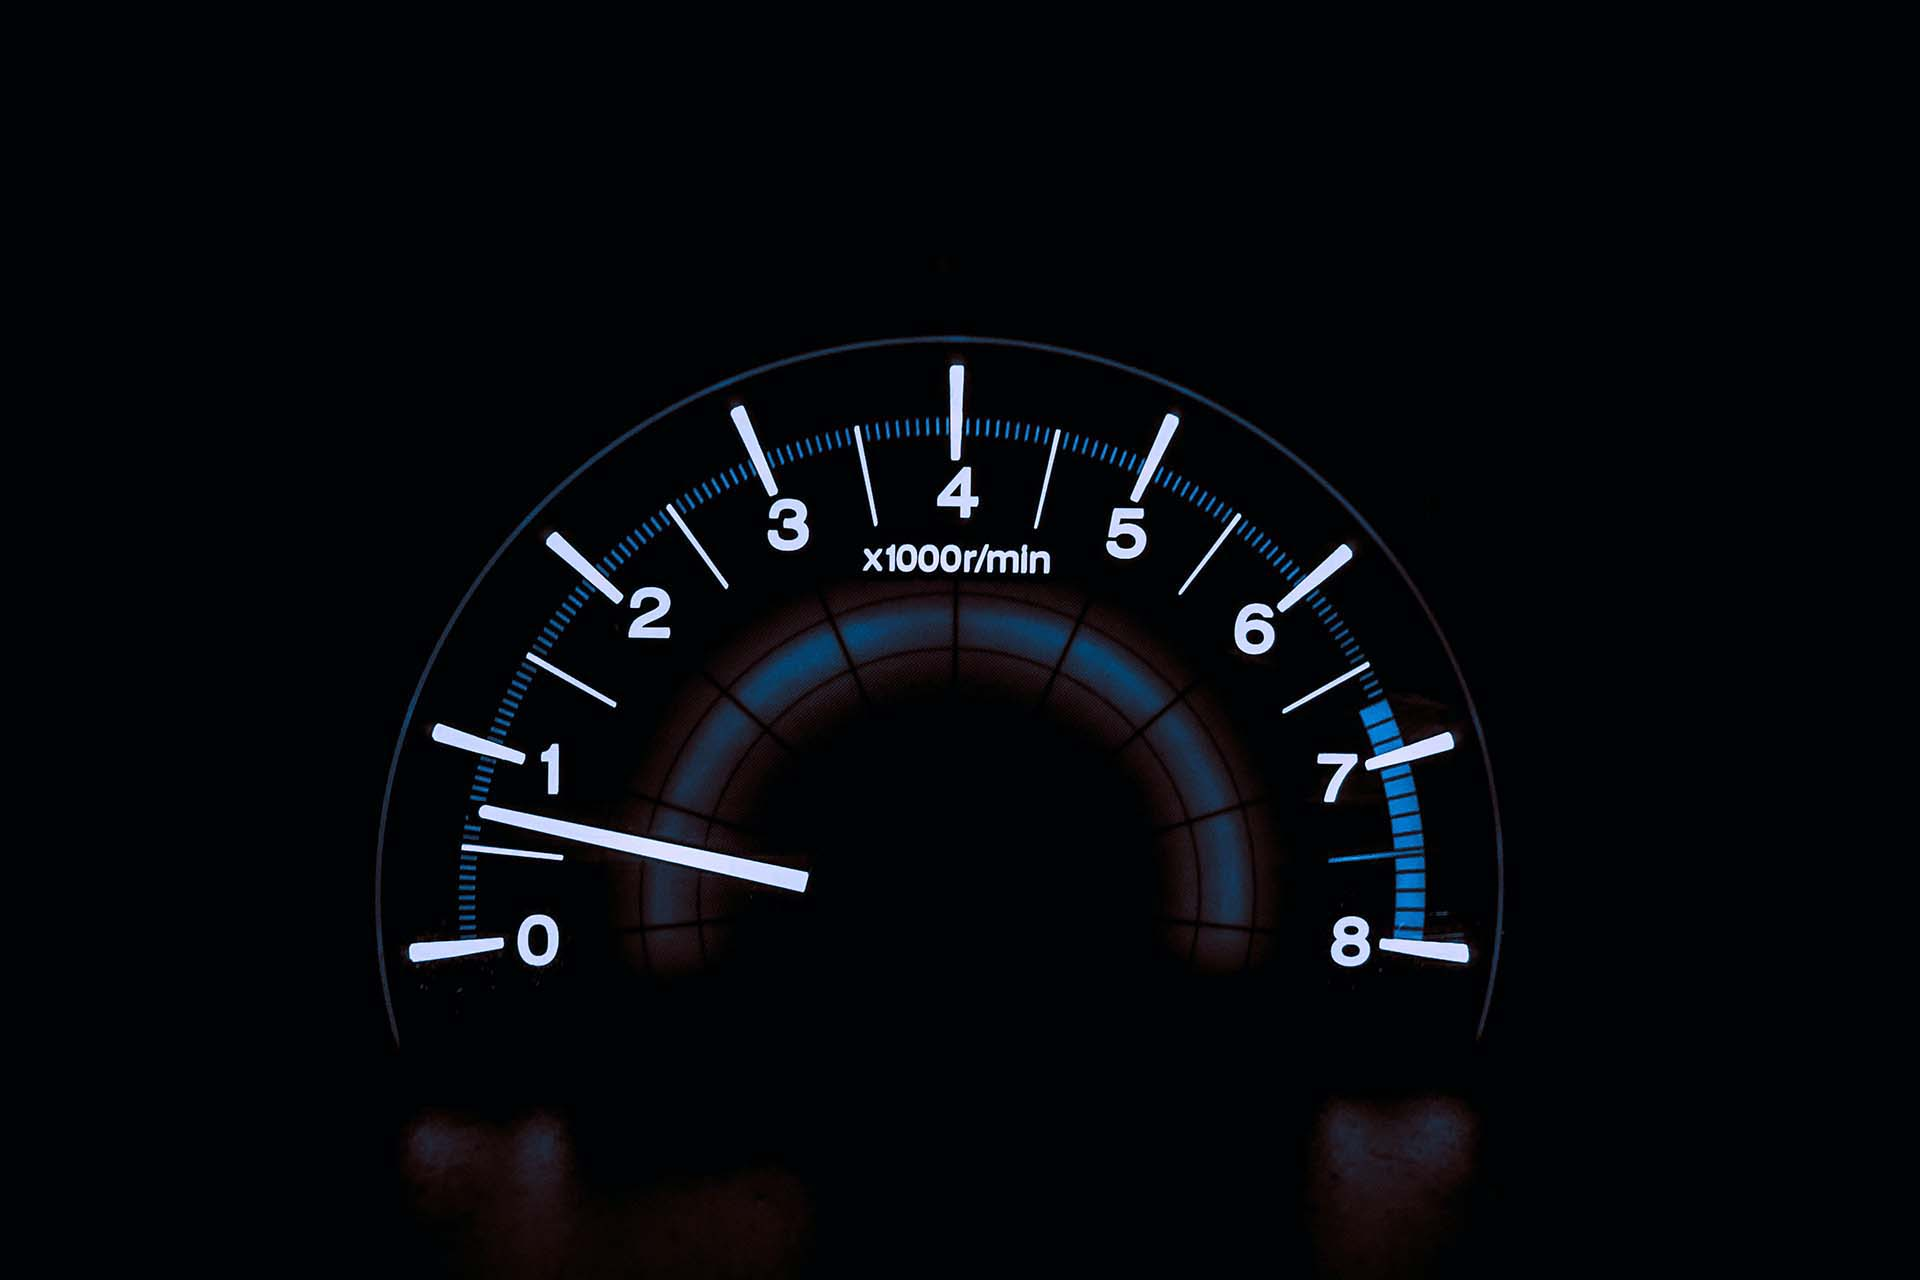 t2informatik Blog: Speed as unfair advantage